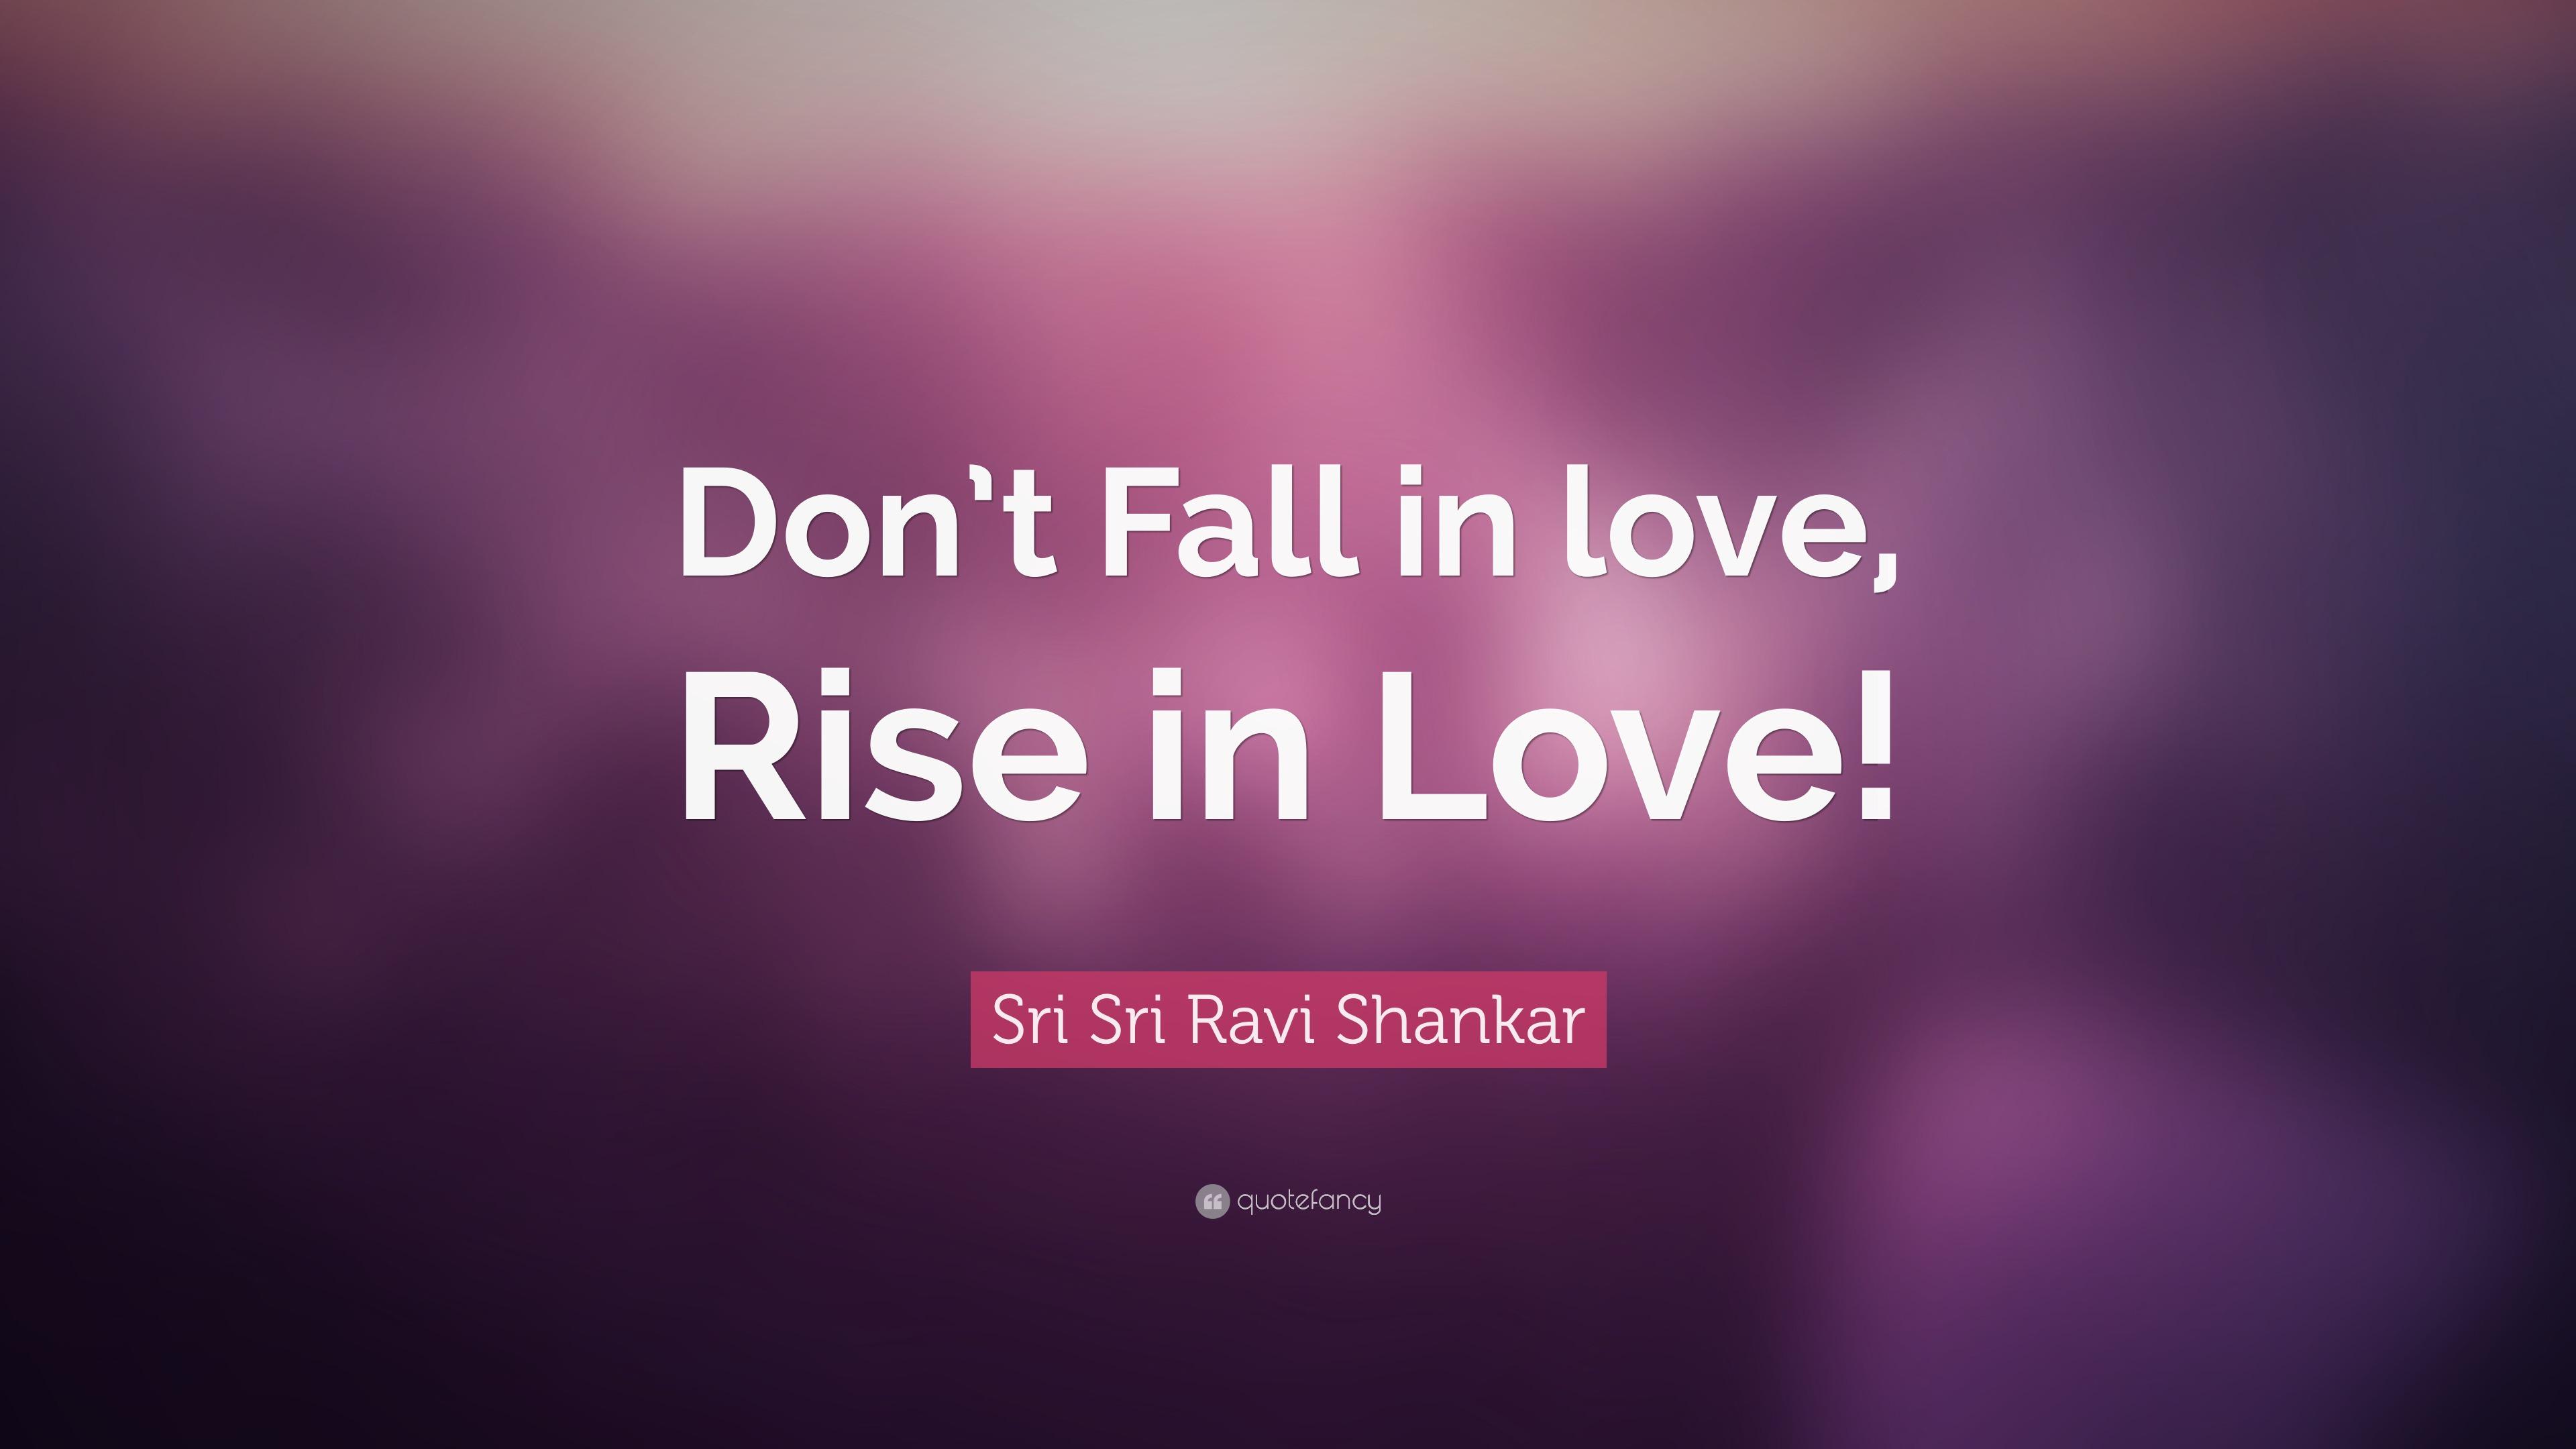 Sri Sri Ravi Shankar Quote Dont Fall In Love Rise In Love 12